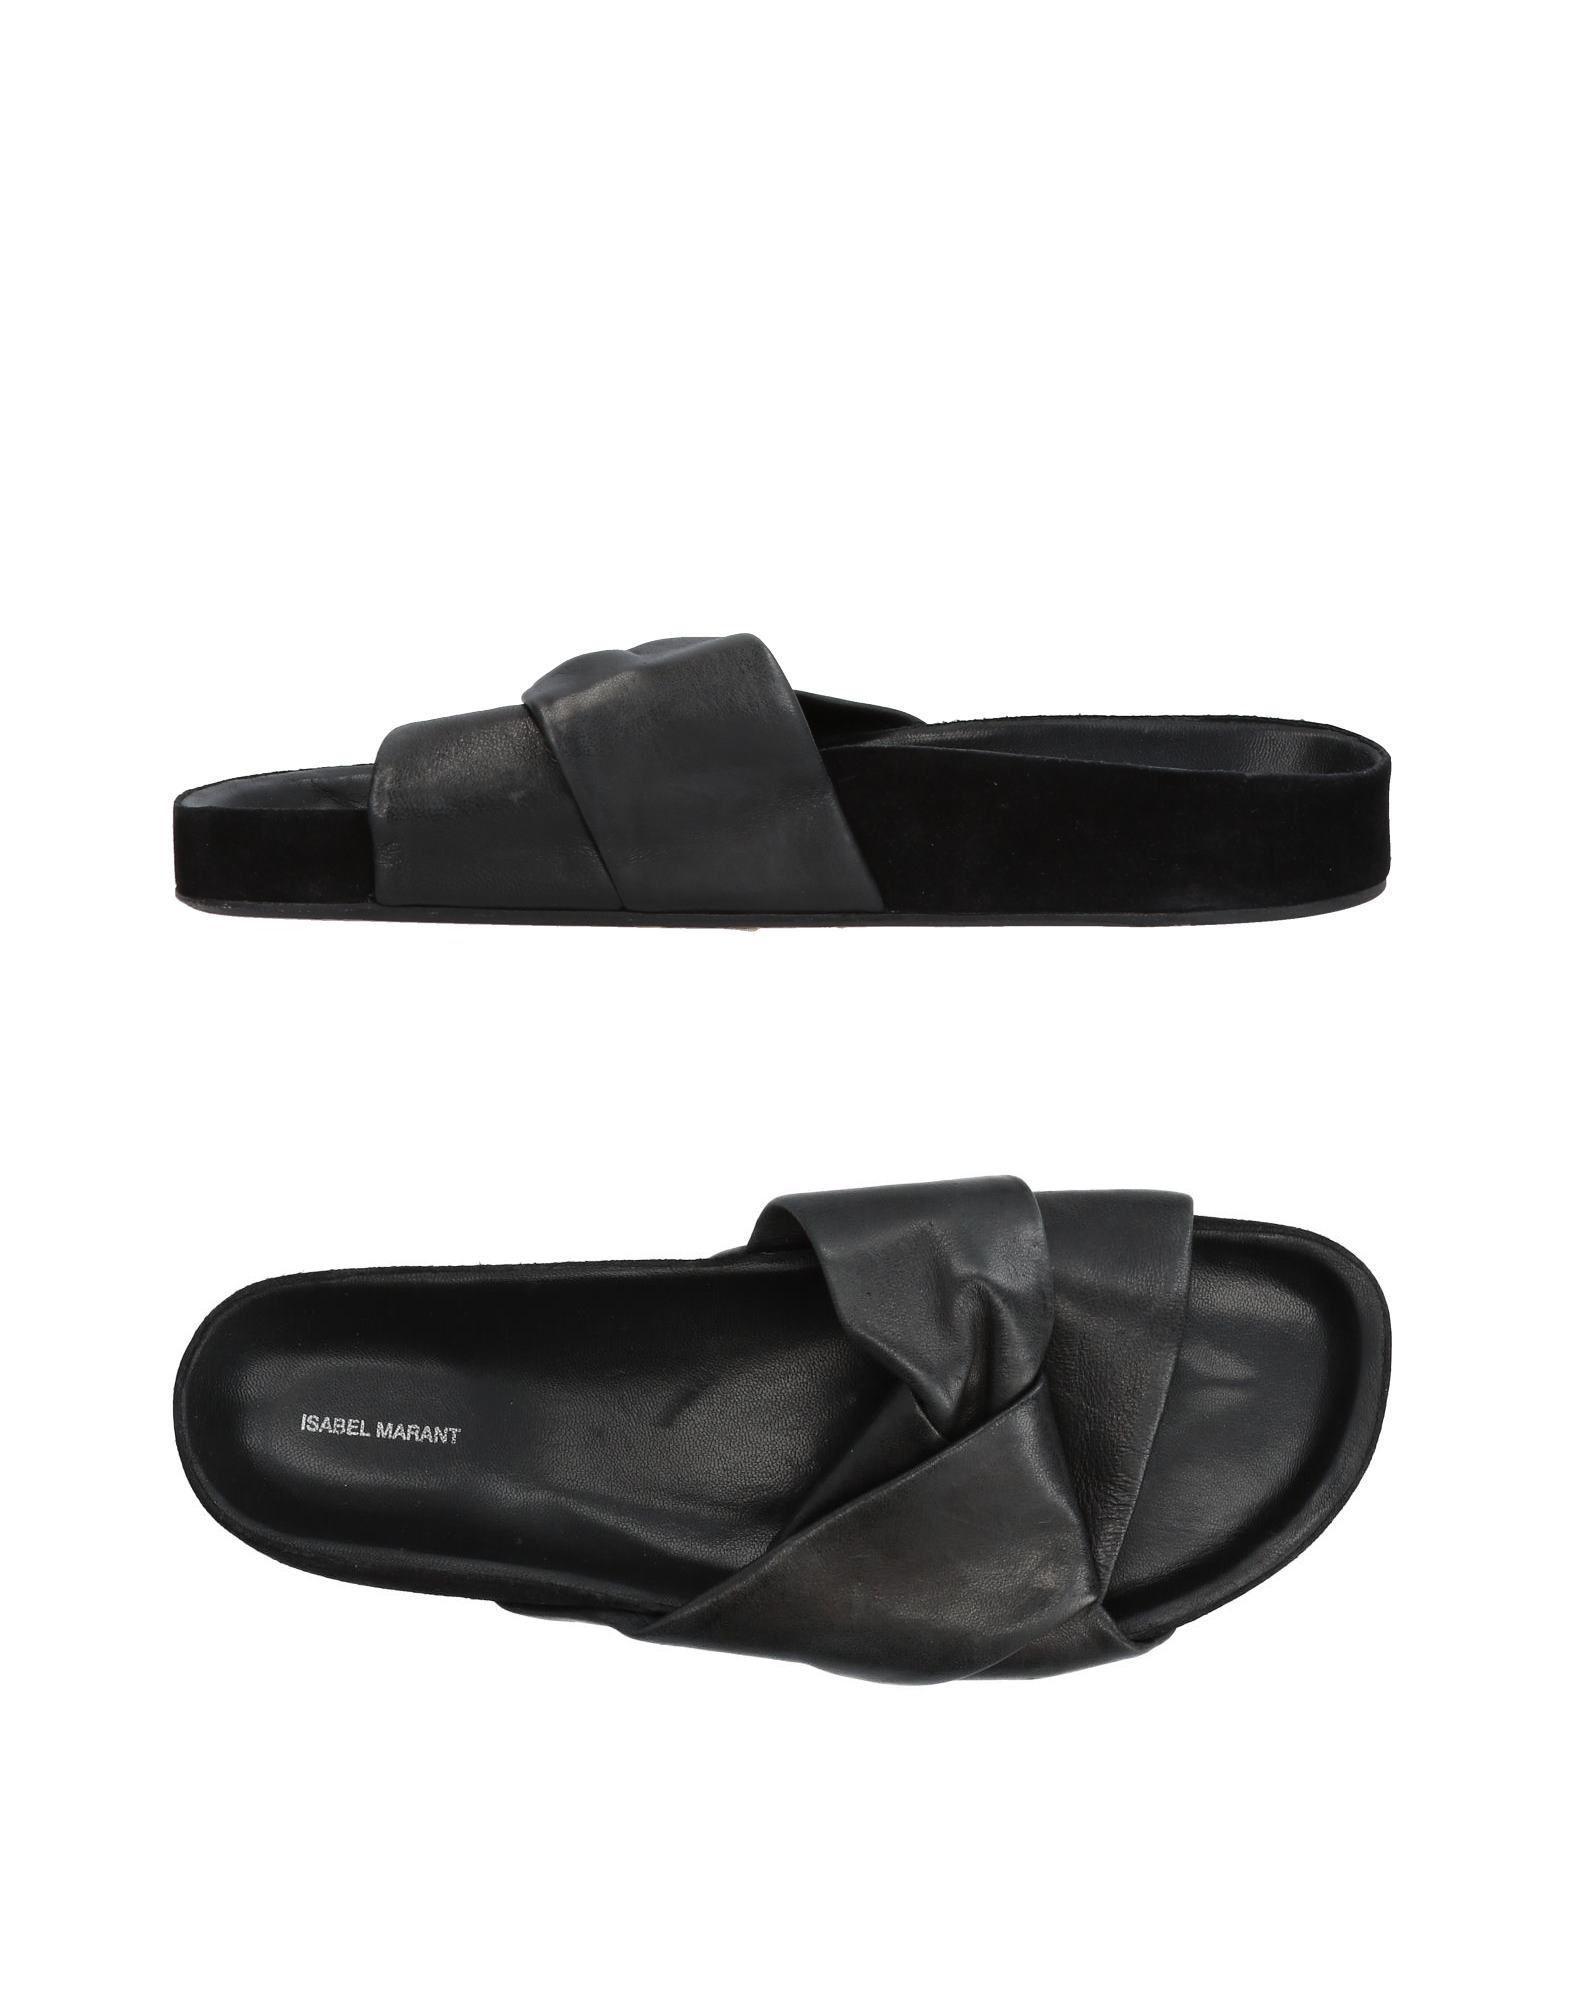 Etoile Isabel Marant Sandals In Black